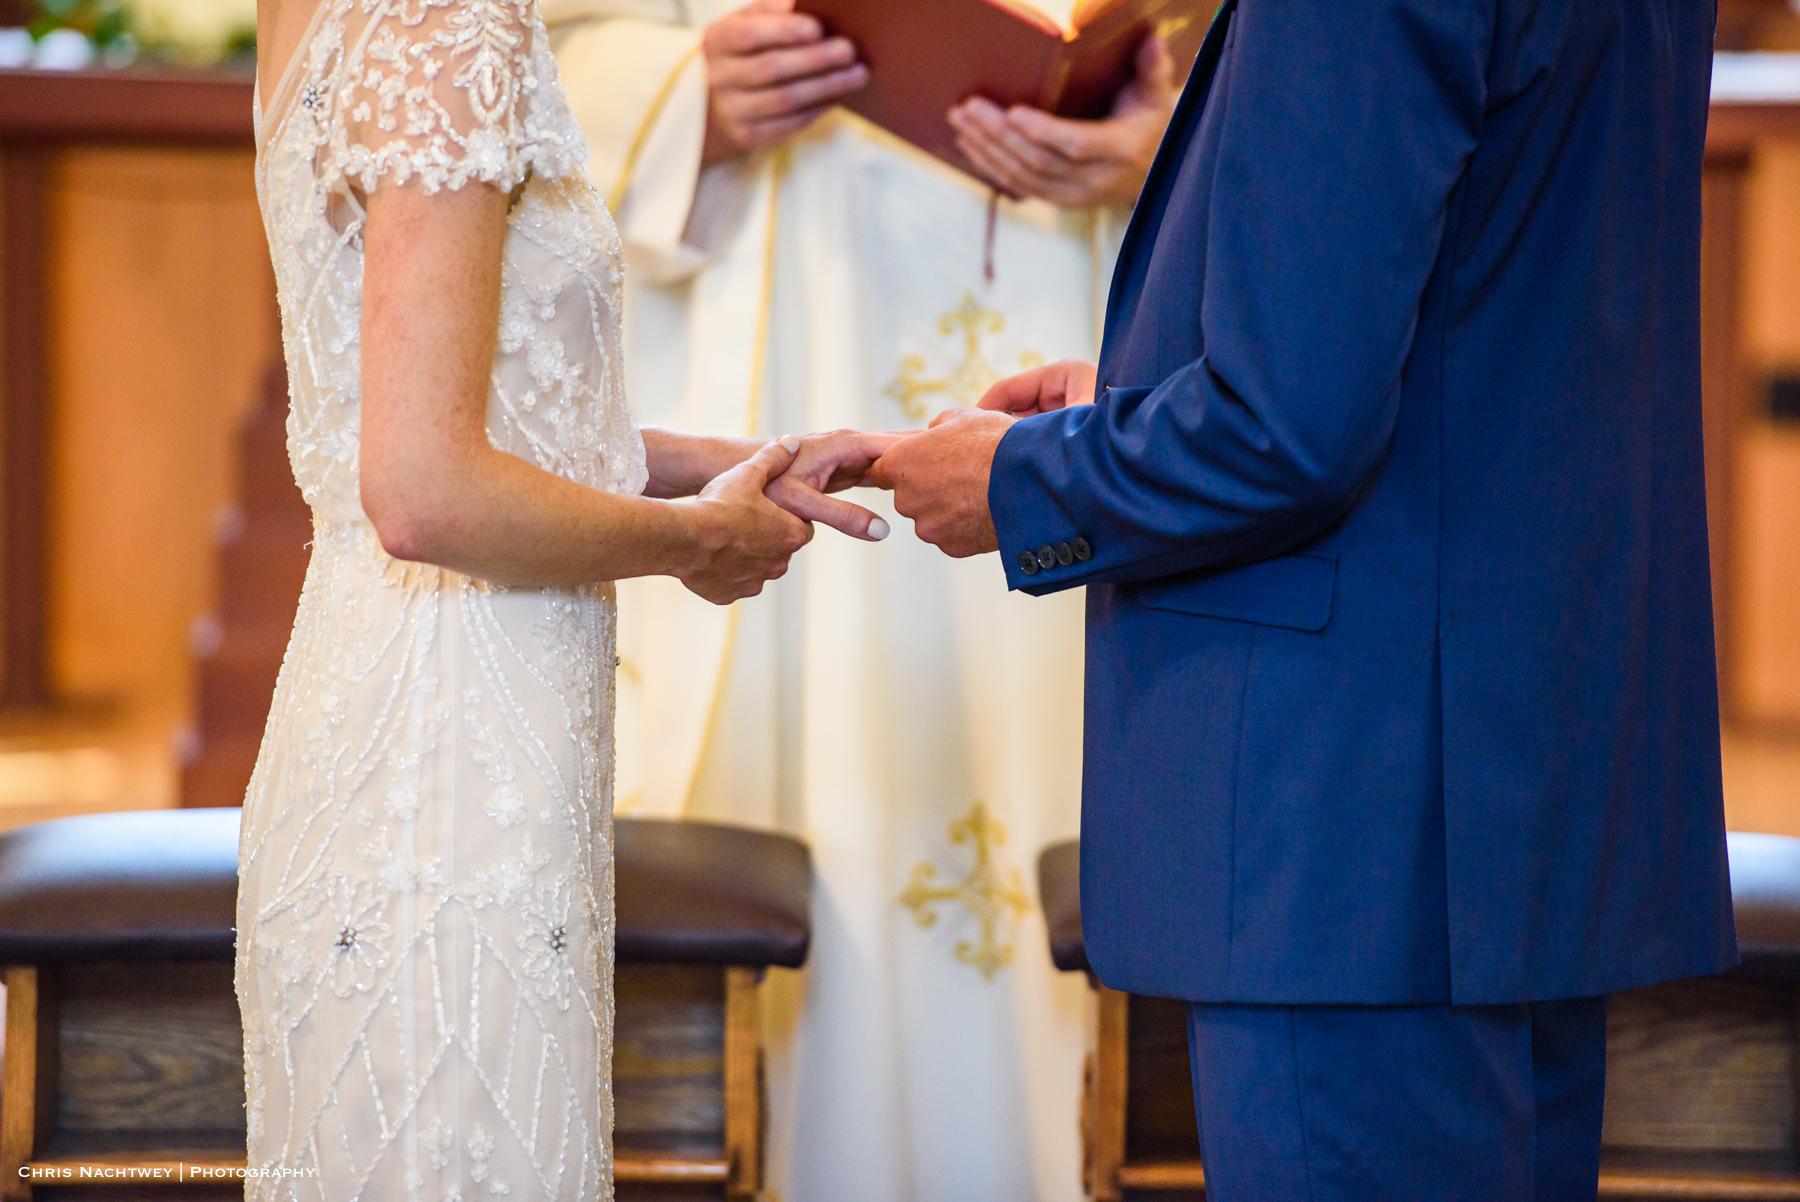 photos-wedding-quidnessett-country-club-ri-chris-nachtwey-photography-2018-23.jpg